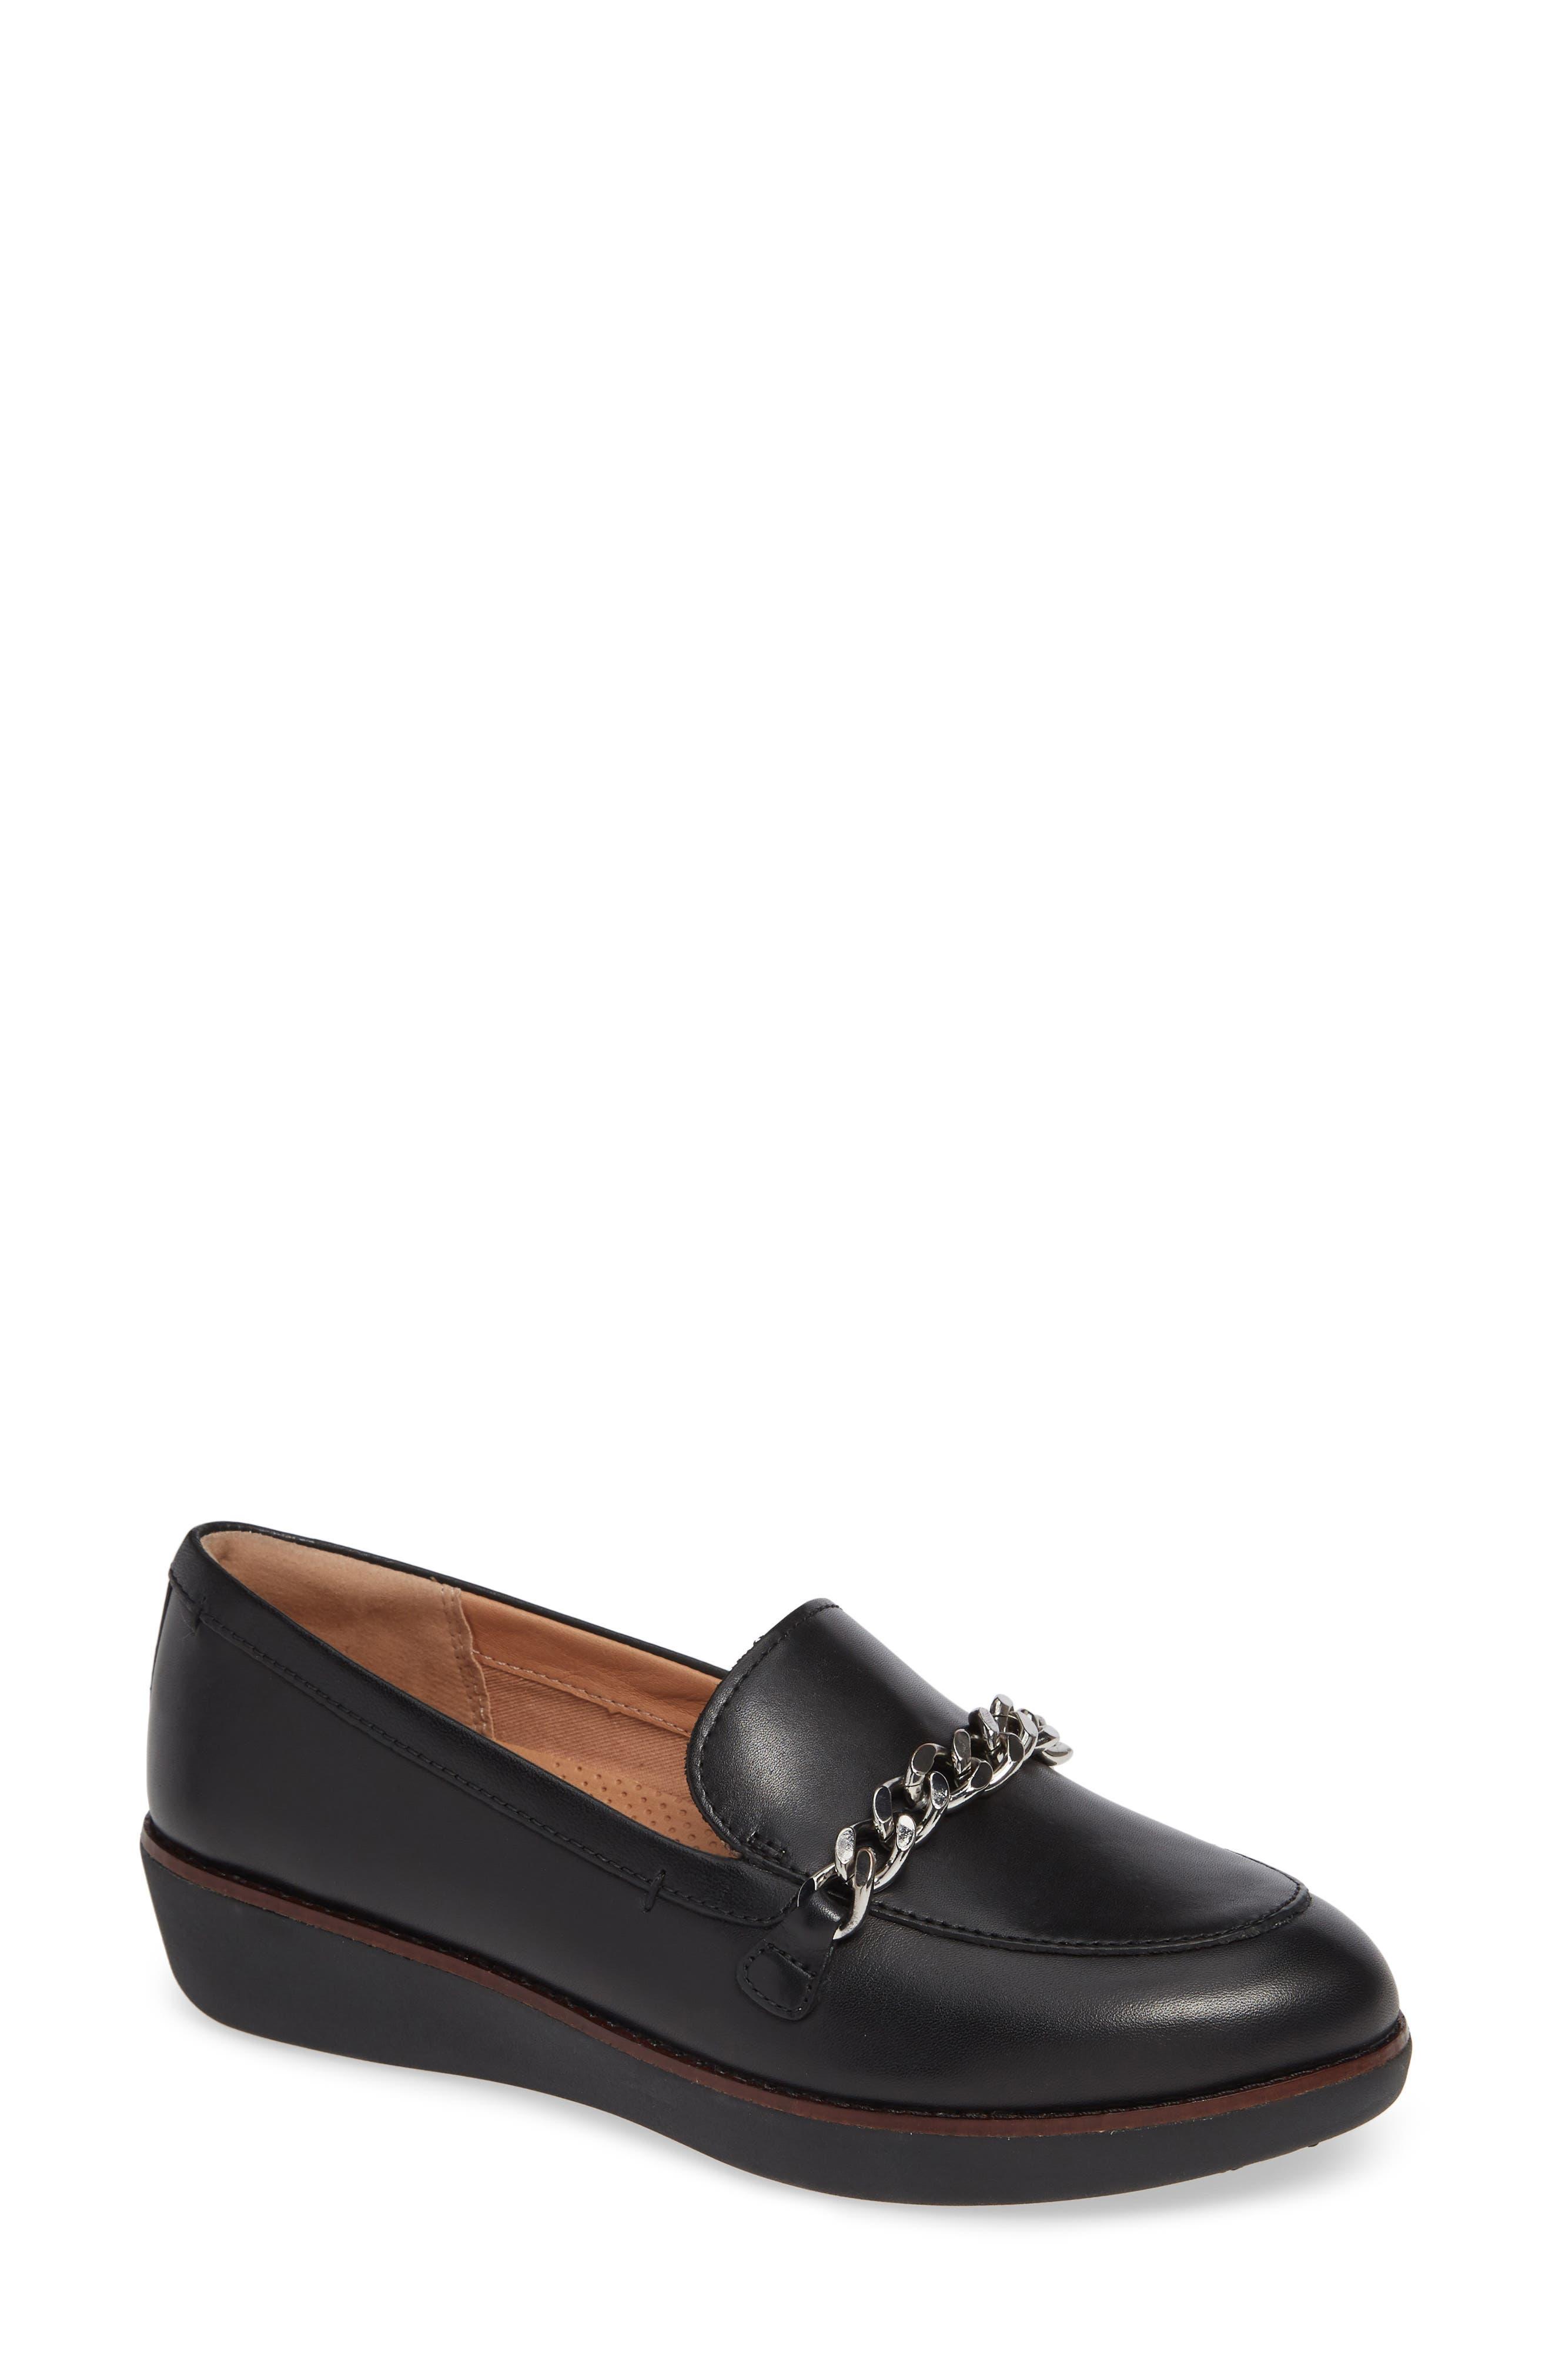 Petrina Chain Loafer,                         Main,                         color, BLACK LEATHER